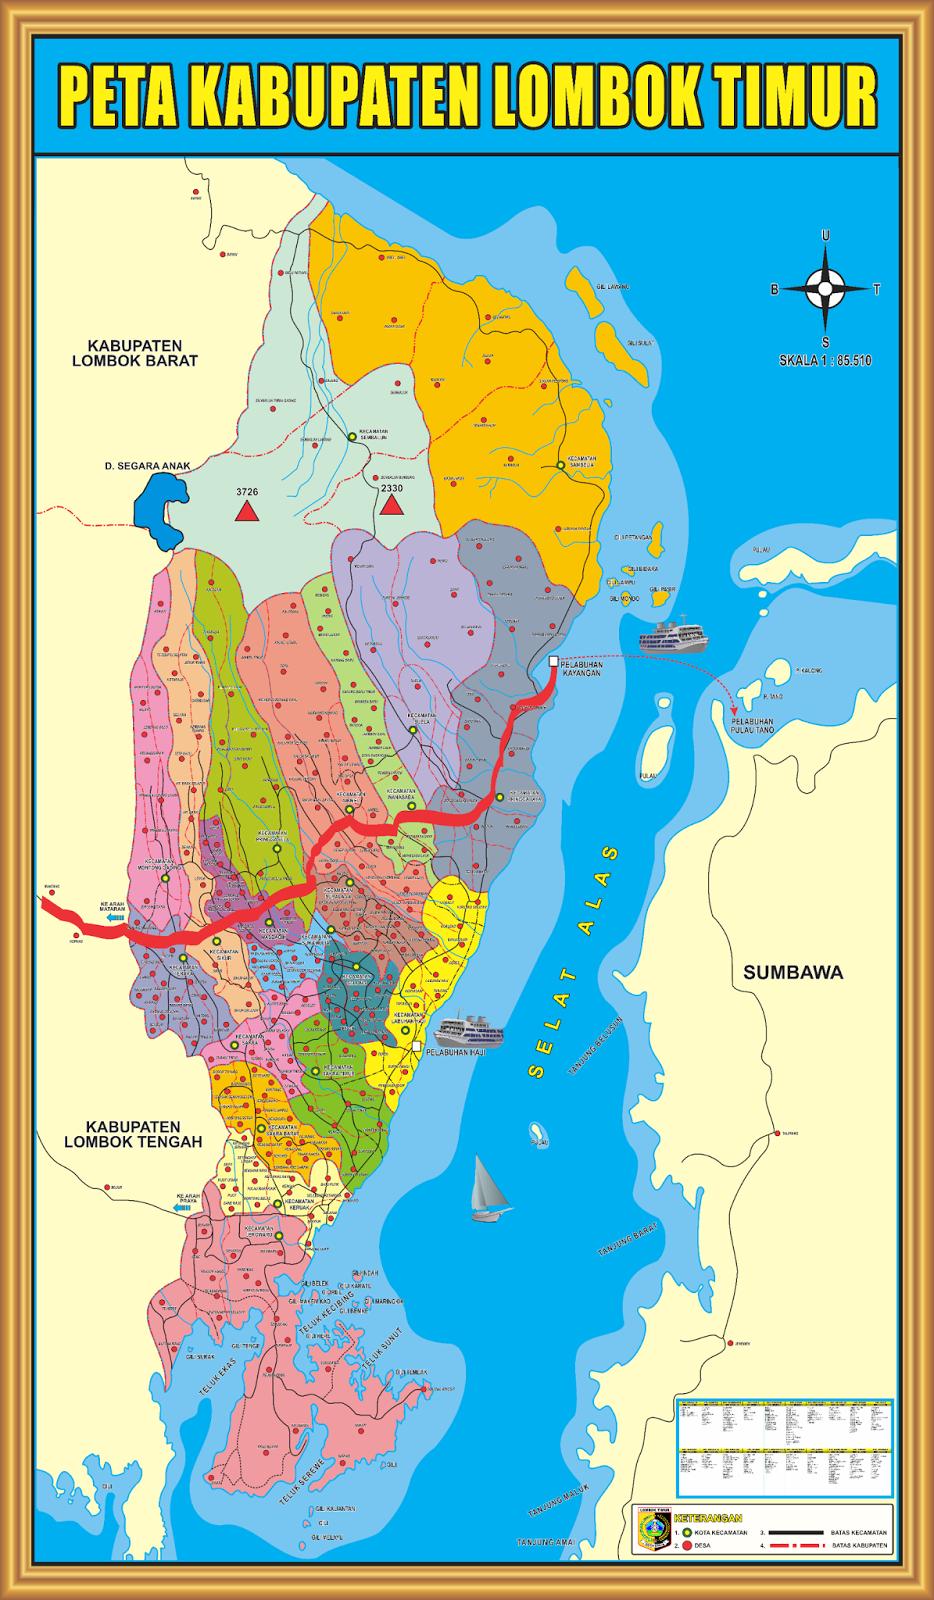 Peta Kabupaten Lombok Timur